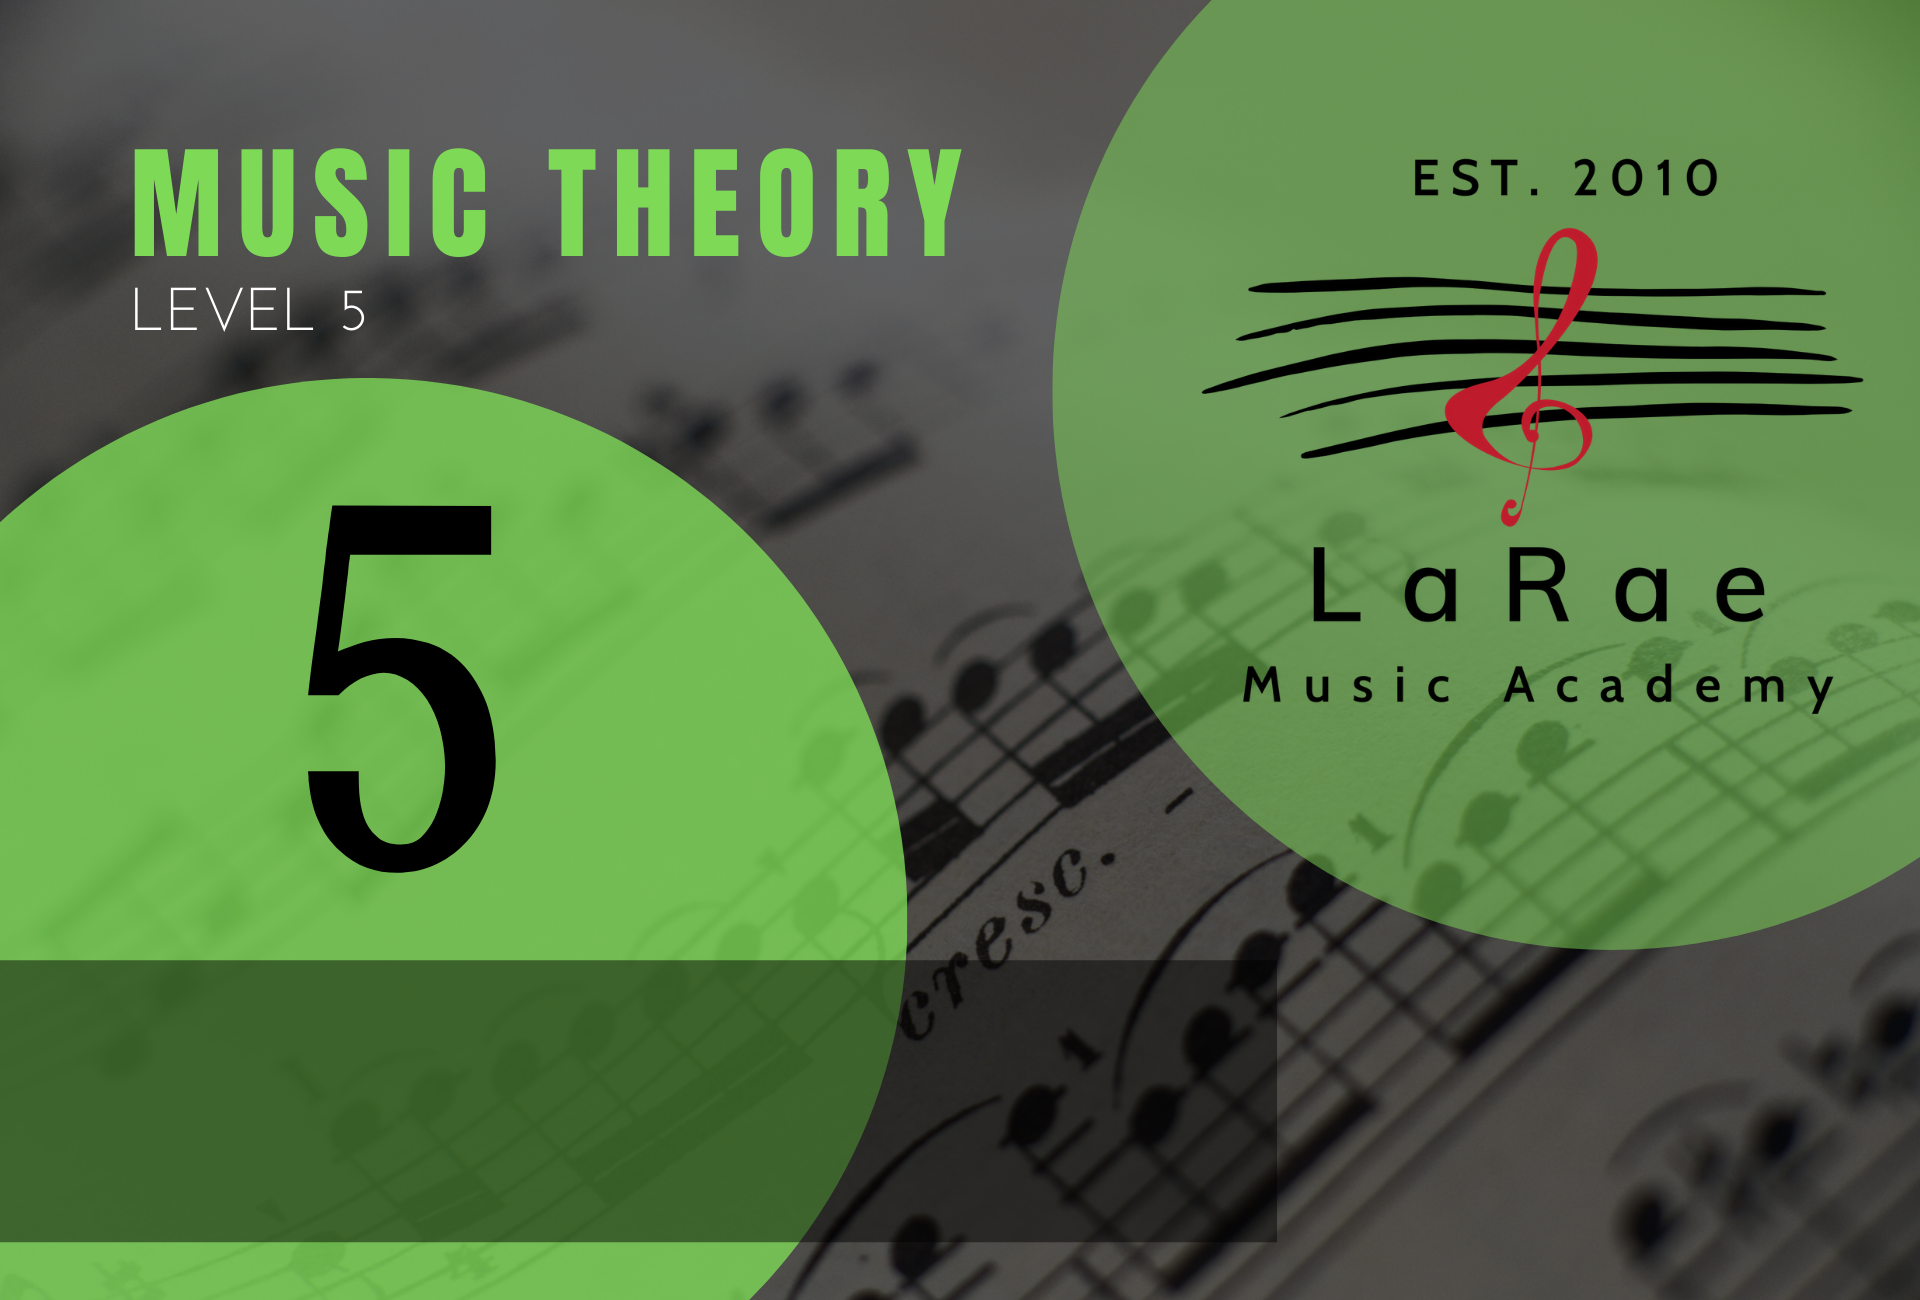 Music Theory Level 5